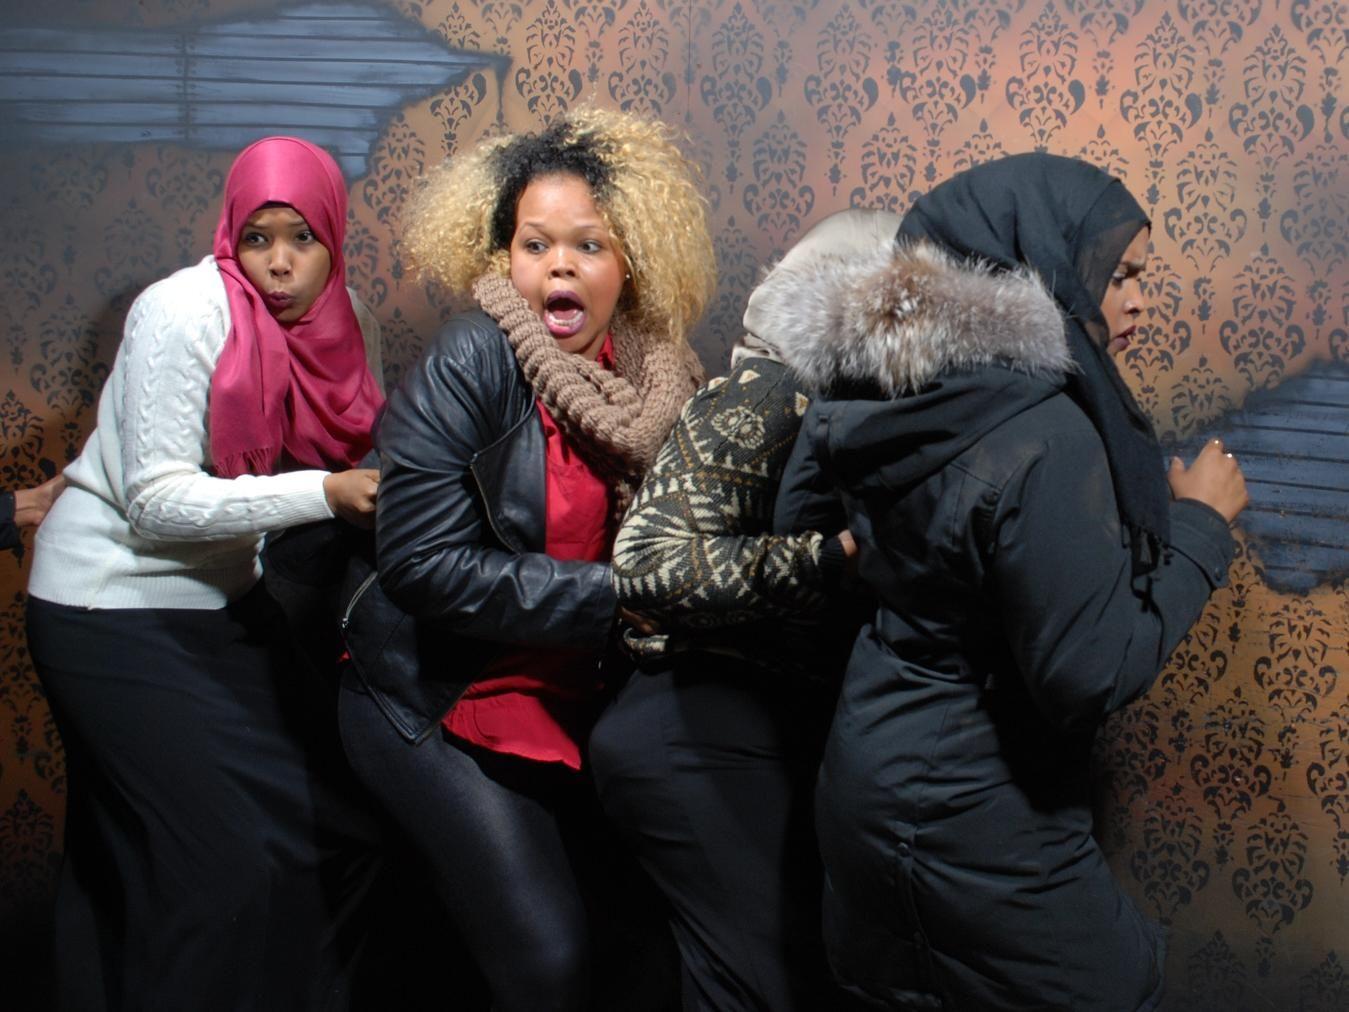 ladies night turns into scream queens inside nightmares fear factory niagara falls best haunted. Black Bedroom Furniture Sets. Home Design Ideas